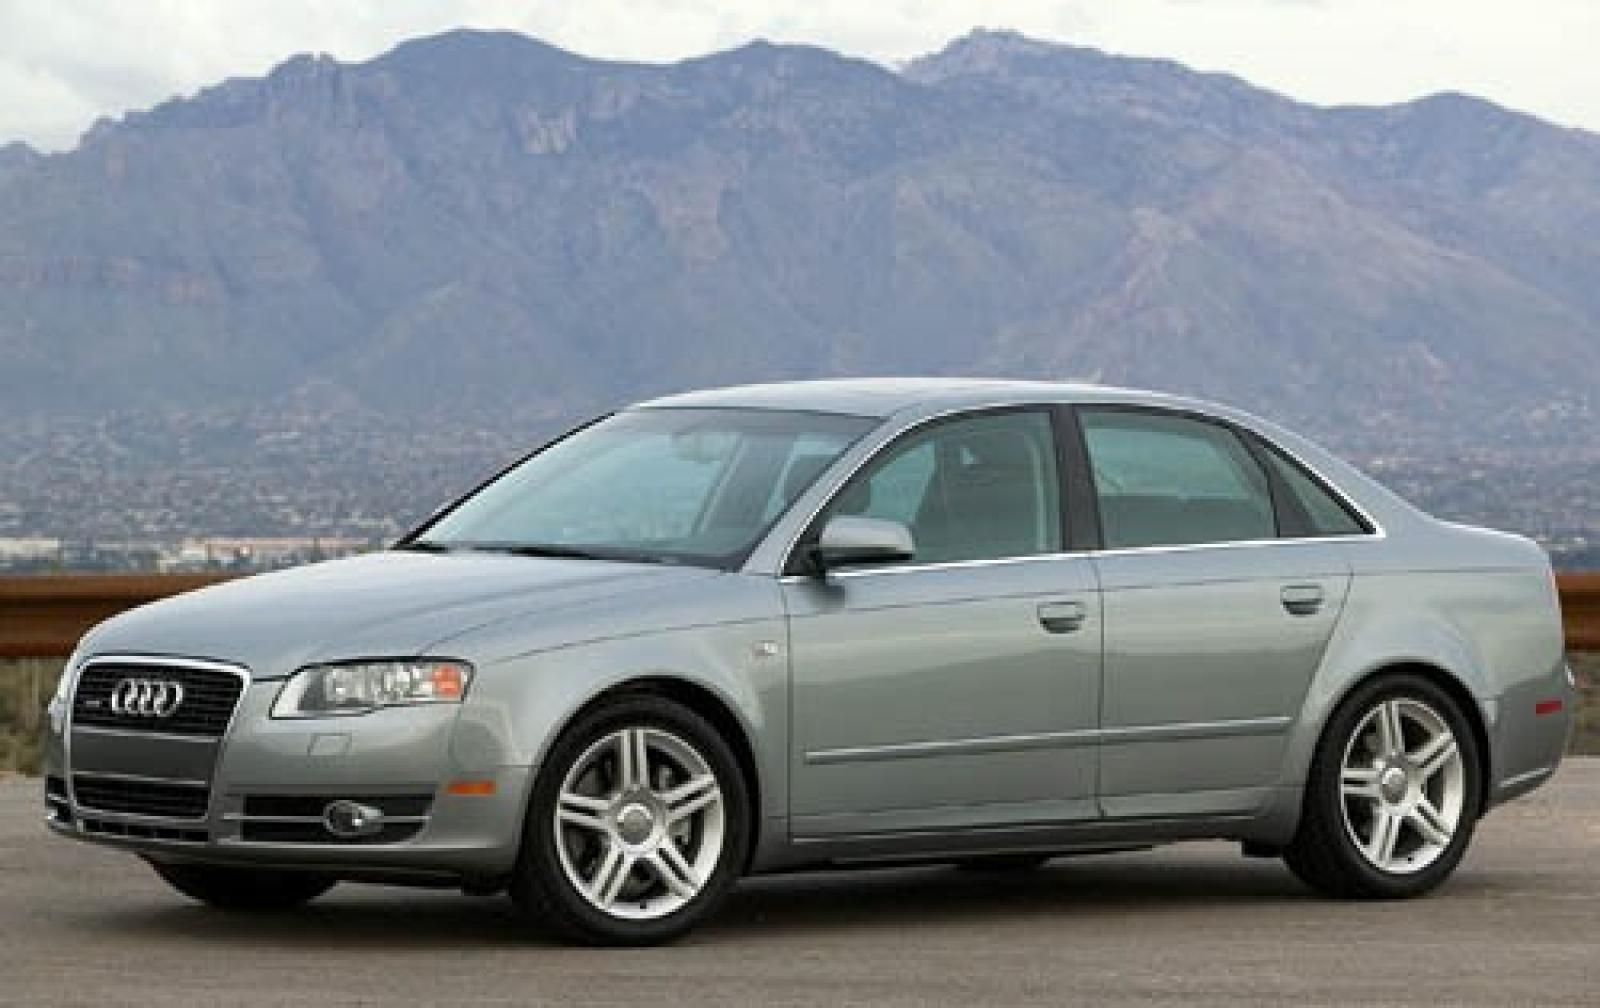 2005 Audi A4 Information And Photos Zombiedrive Engine Schematics 800 1024 1280 1600 Origin